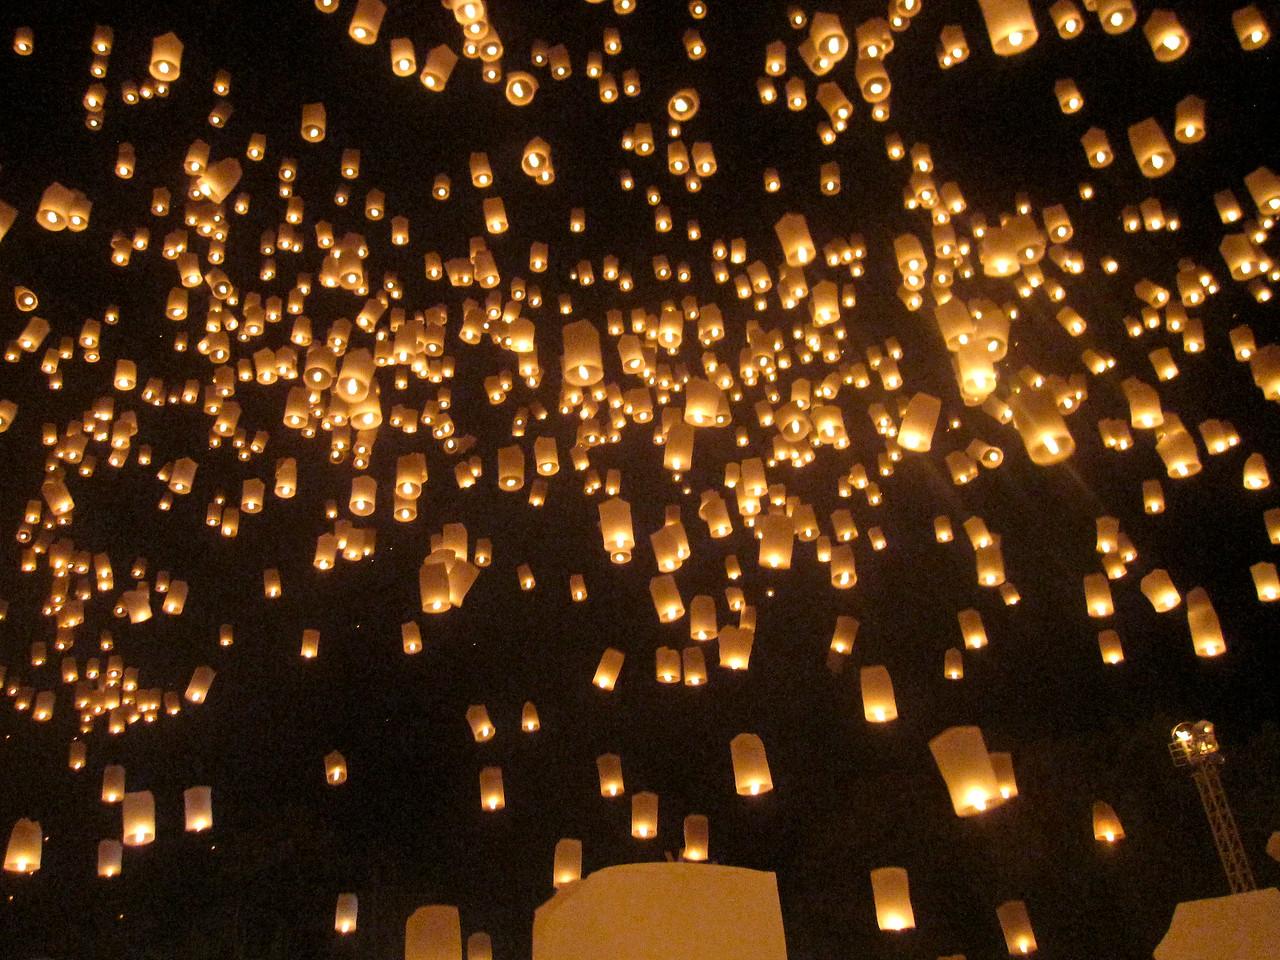 Huge lantern release during Loy Krathong in Chiang Mai, Thailand